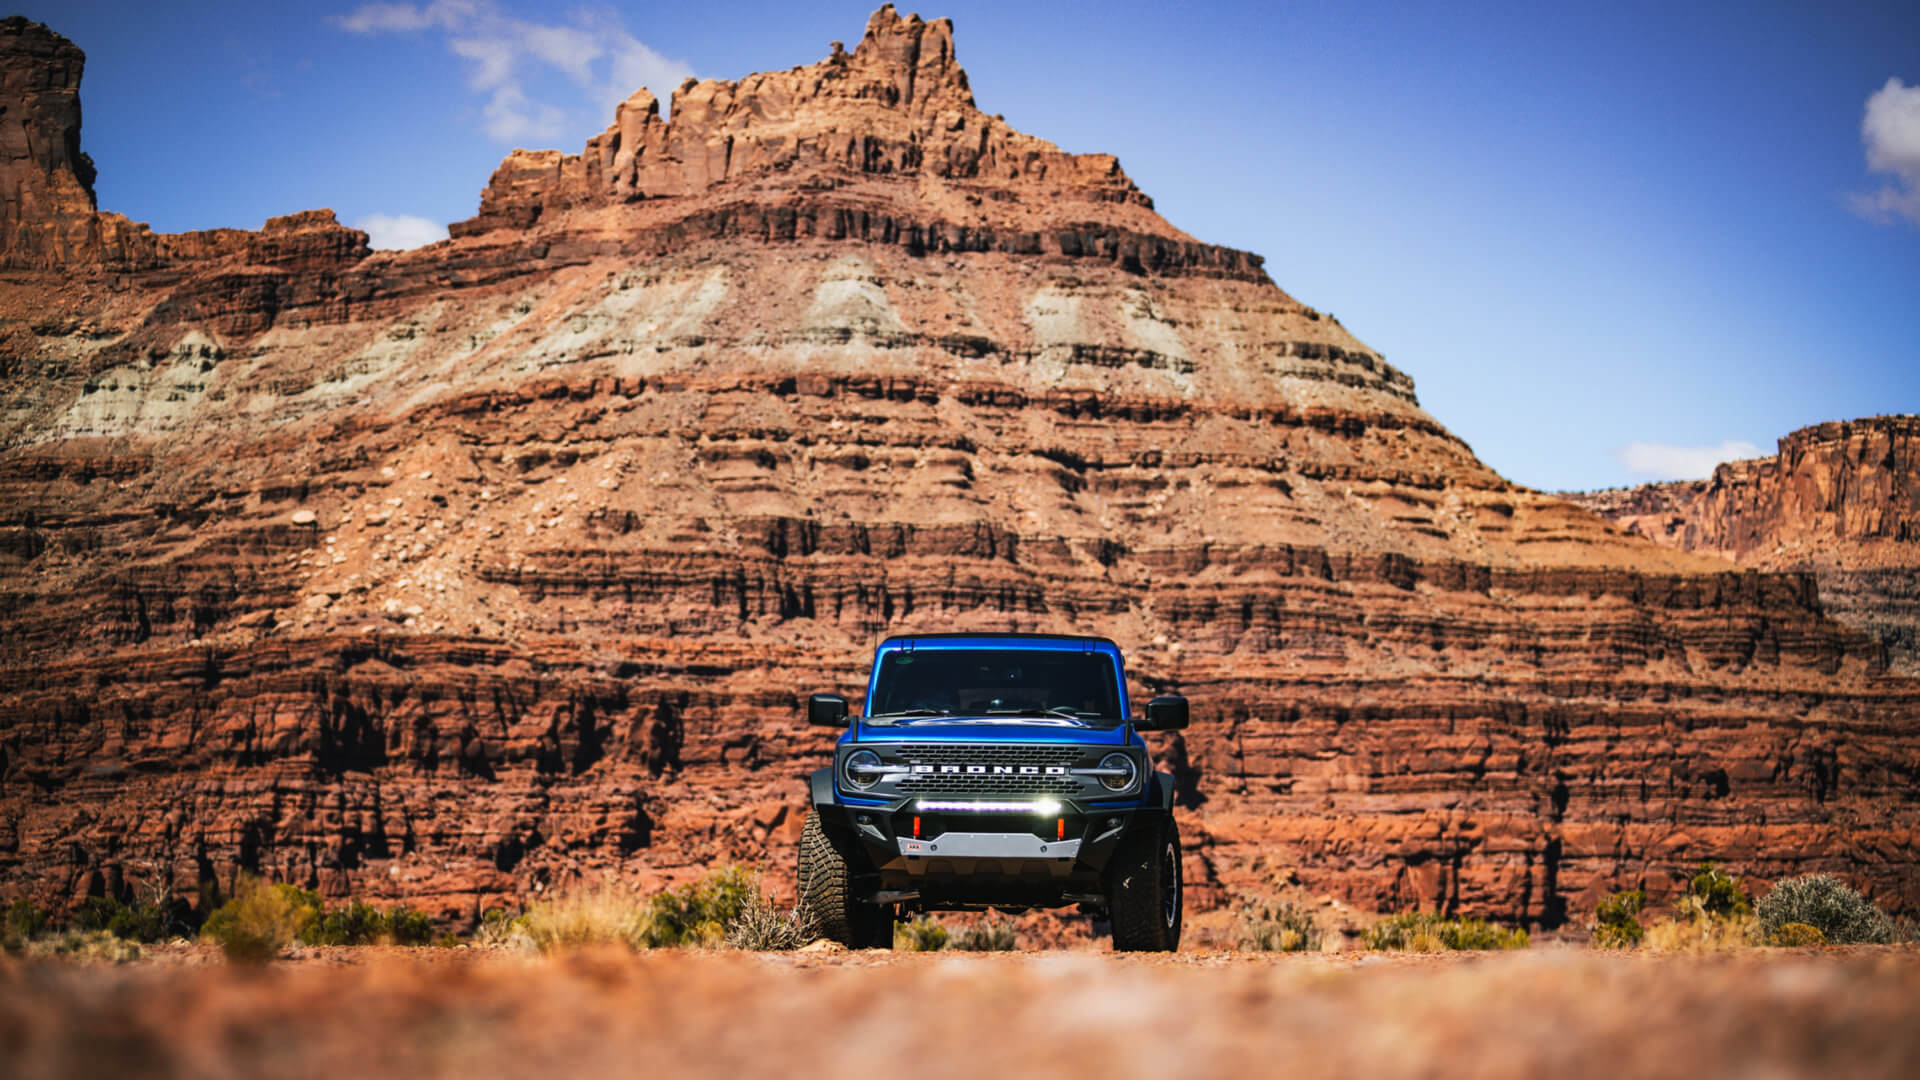 ARB Bronco in Moab, Utah